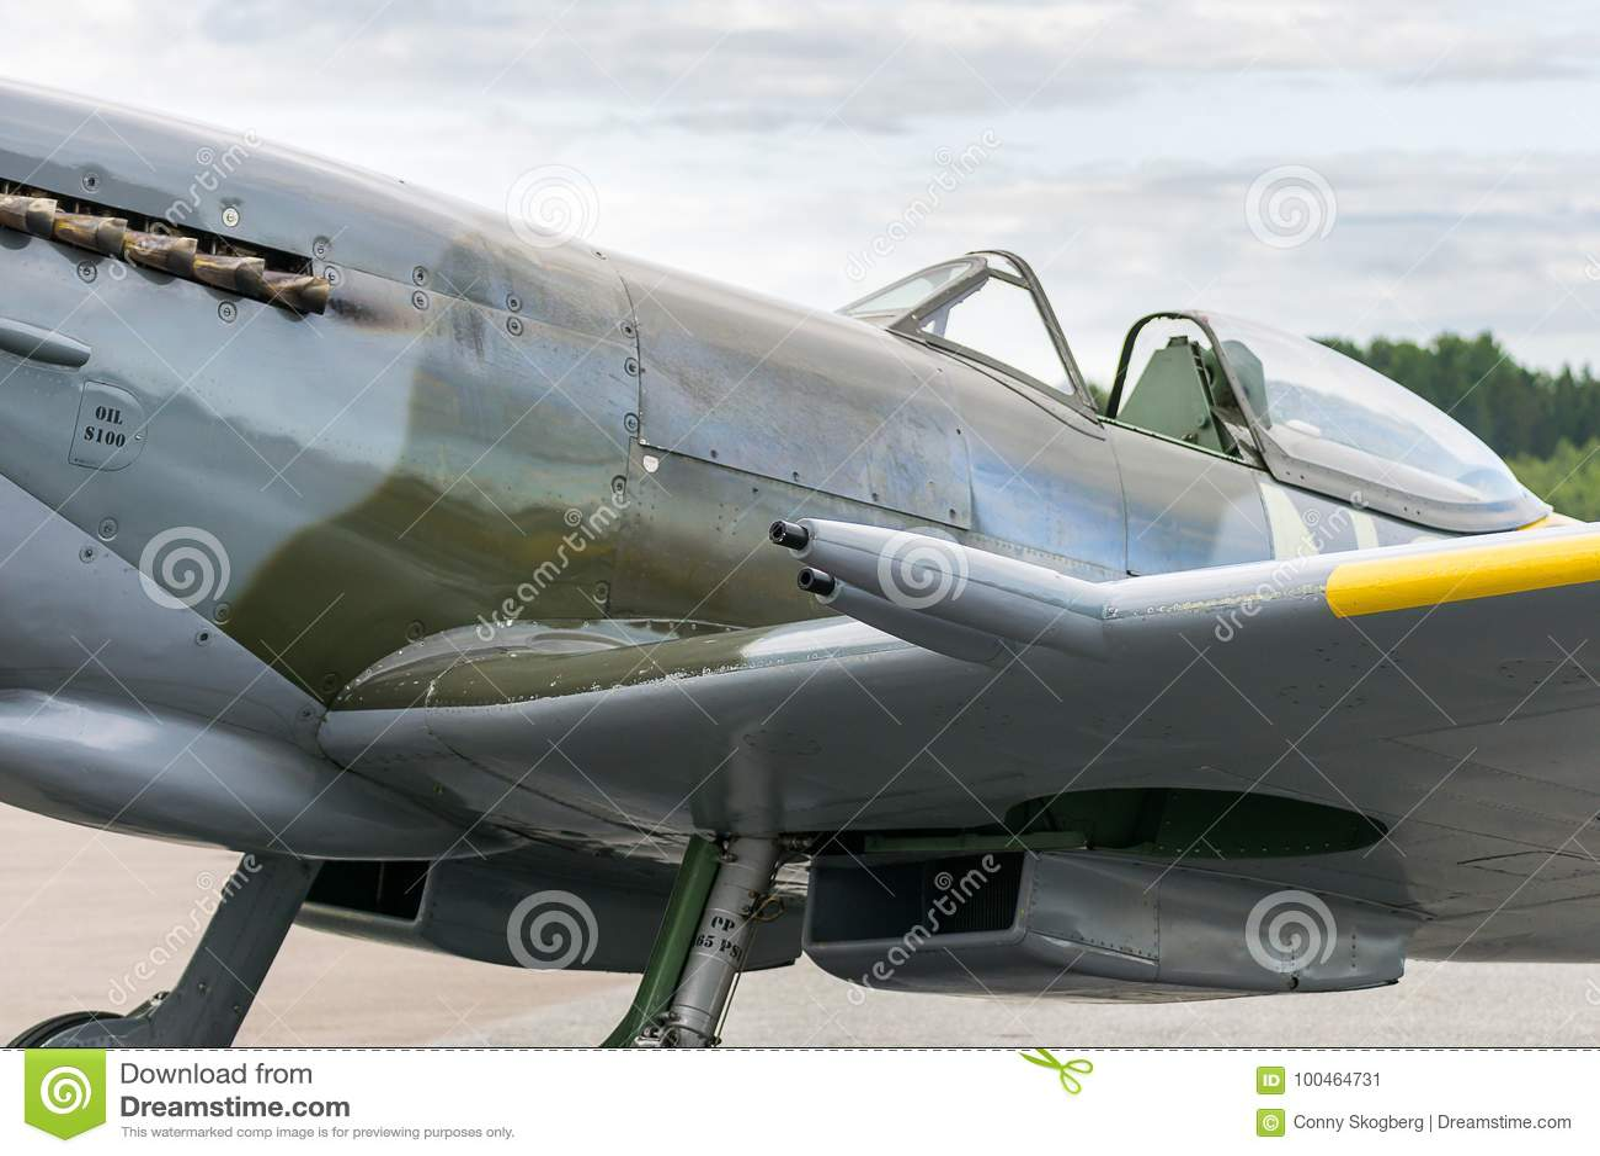 Air Show Spitfire Mk XVI Airplane Flying Editorial Photo